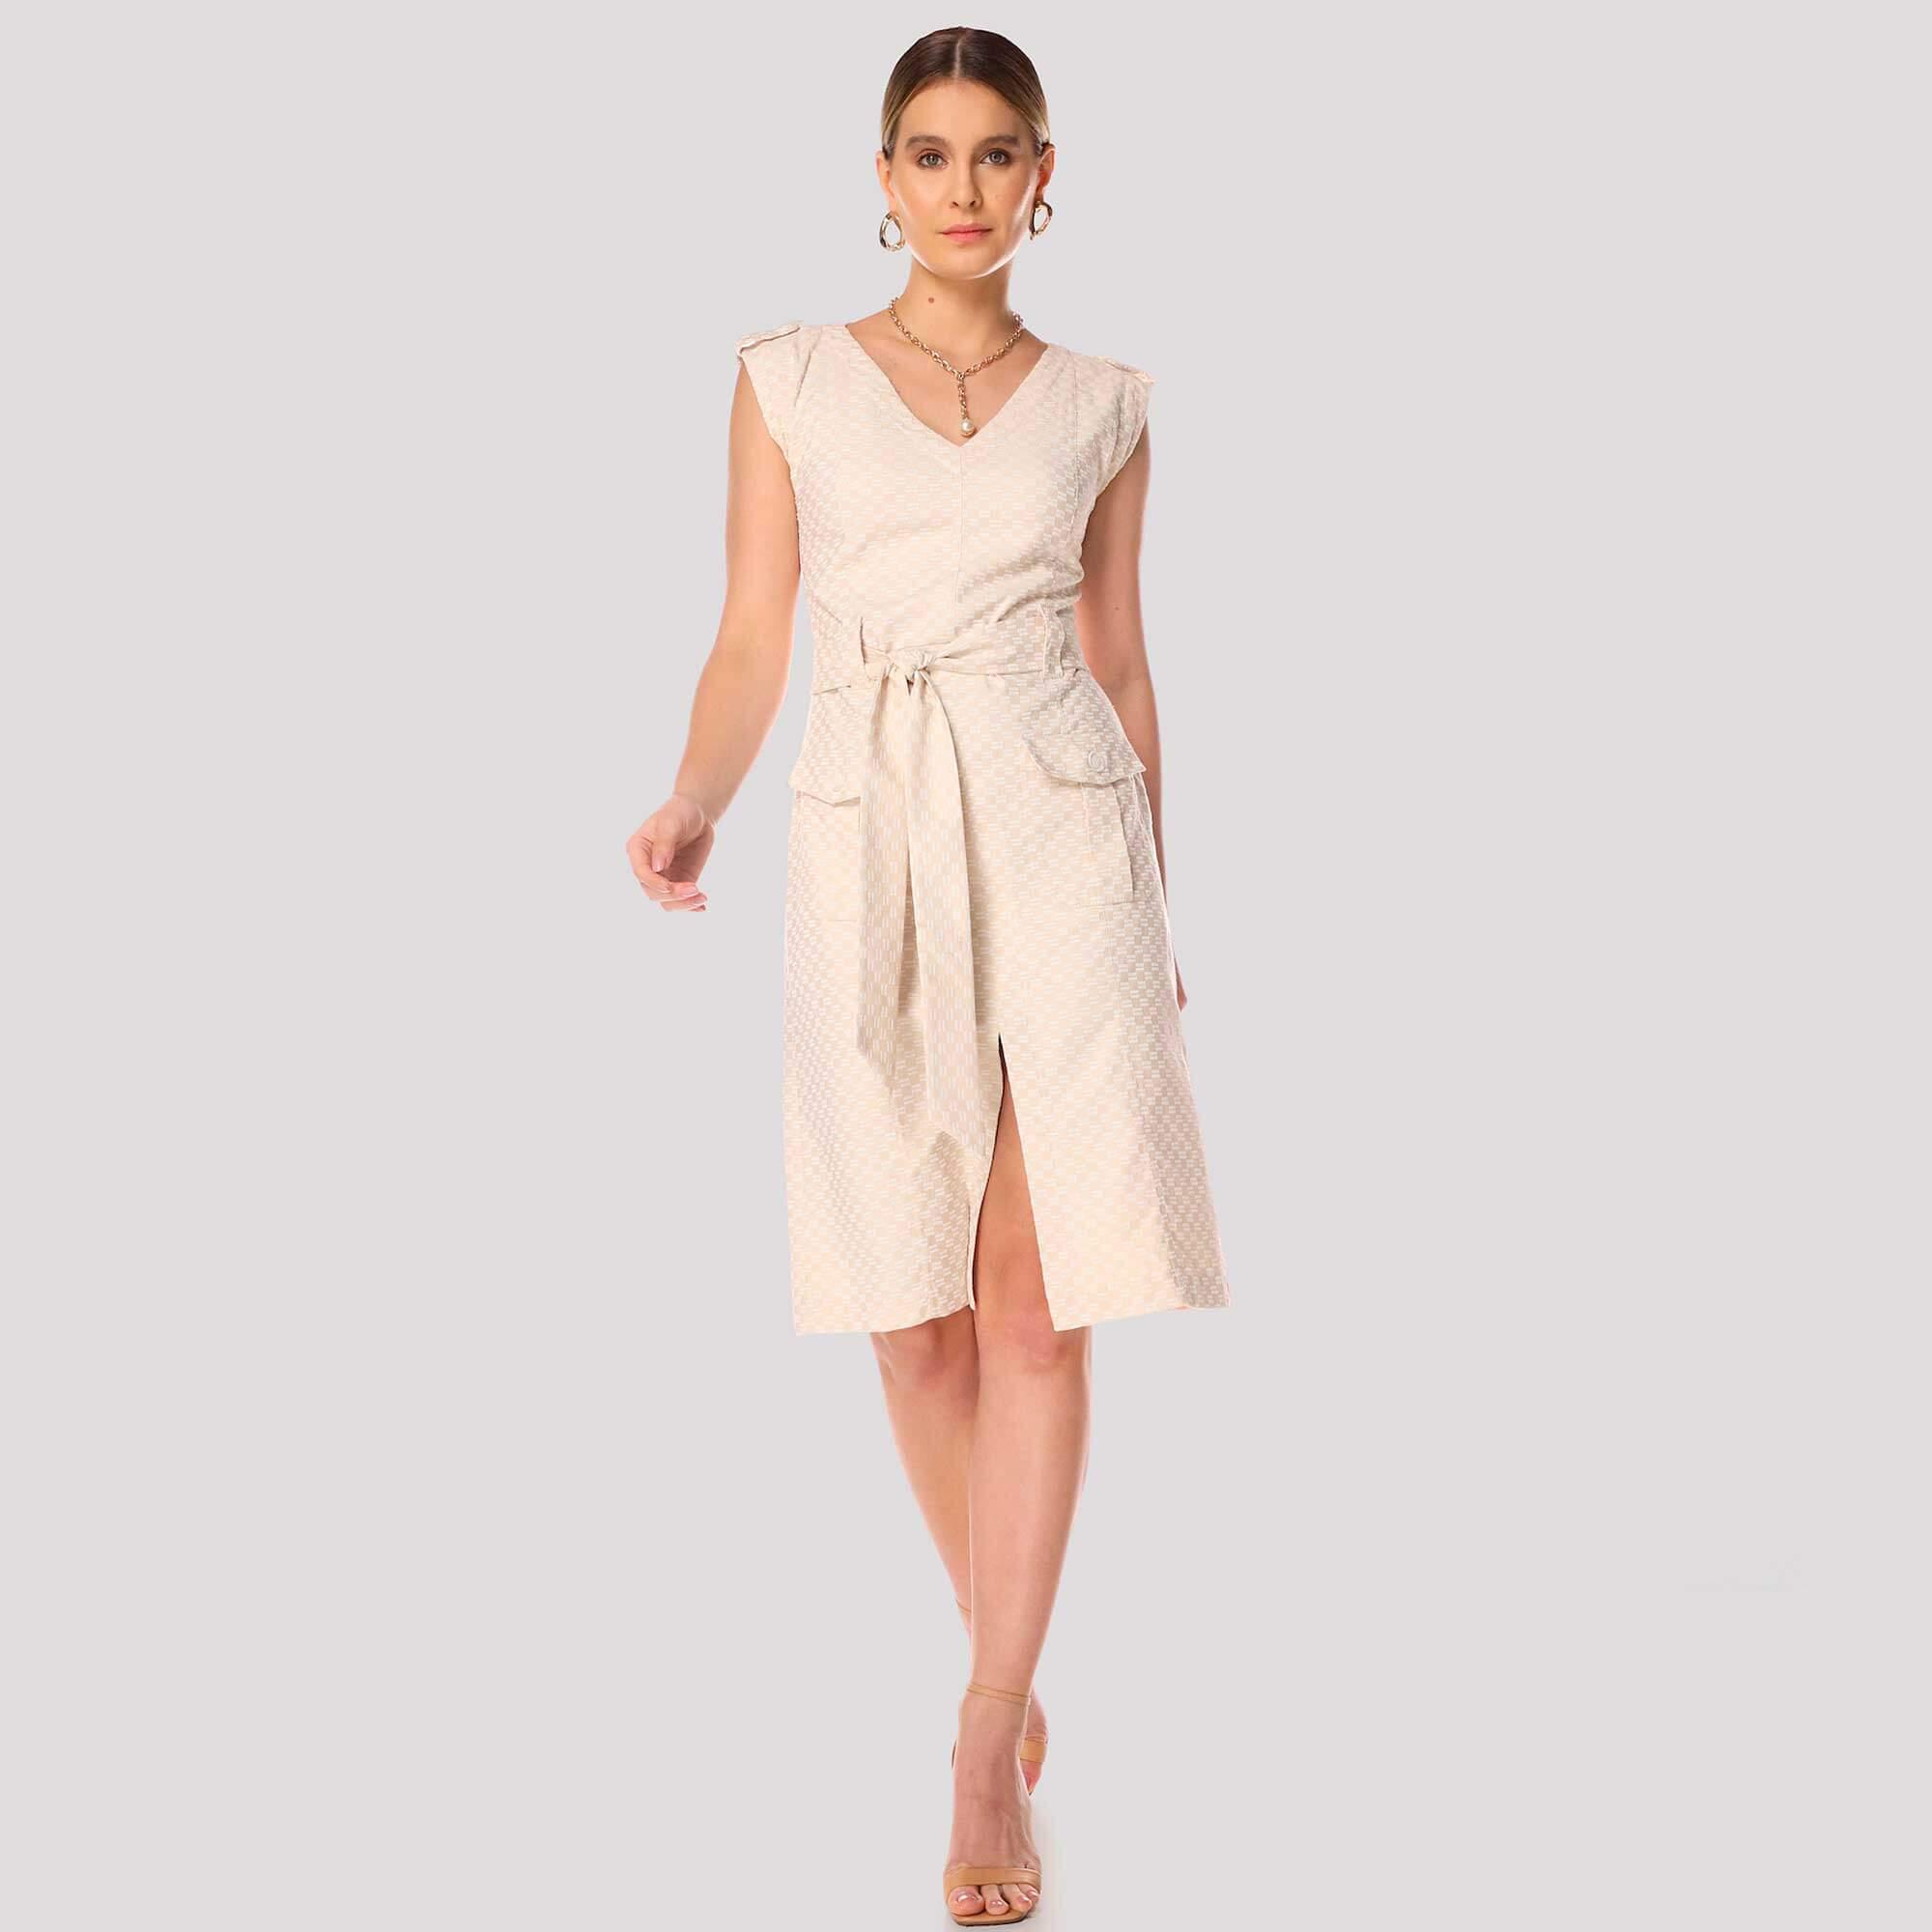 Vestido Jacquard C/ Bolsos